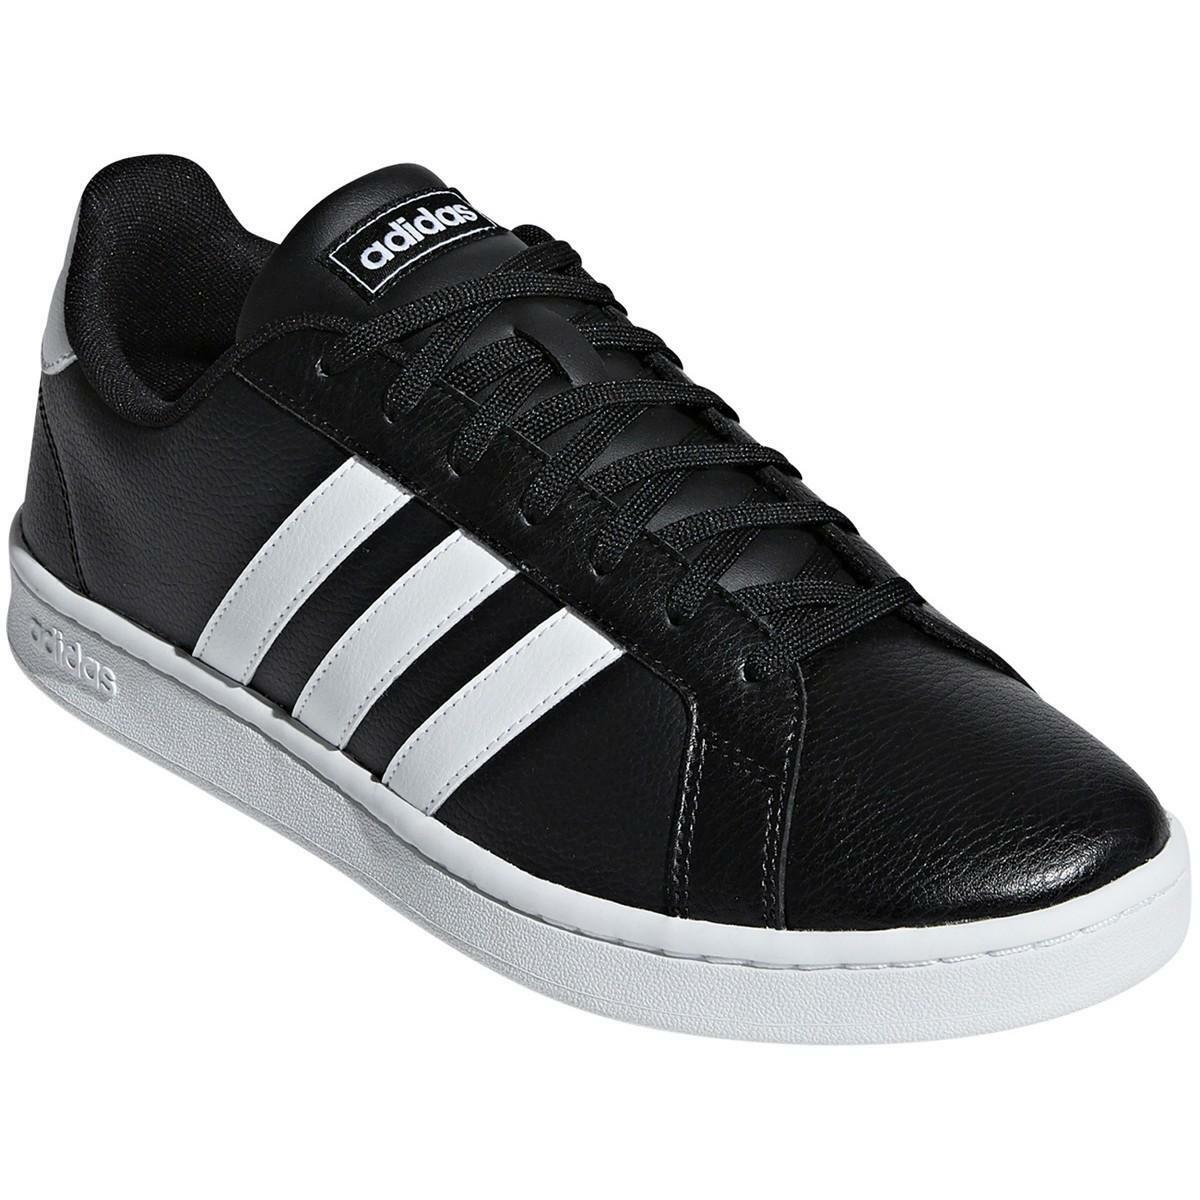 adidas adidas grand court uomo f36393 nero